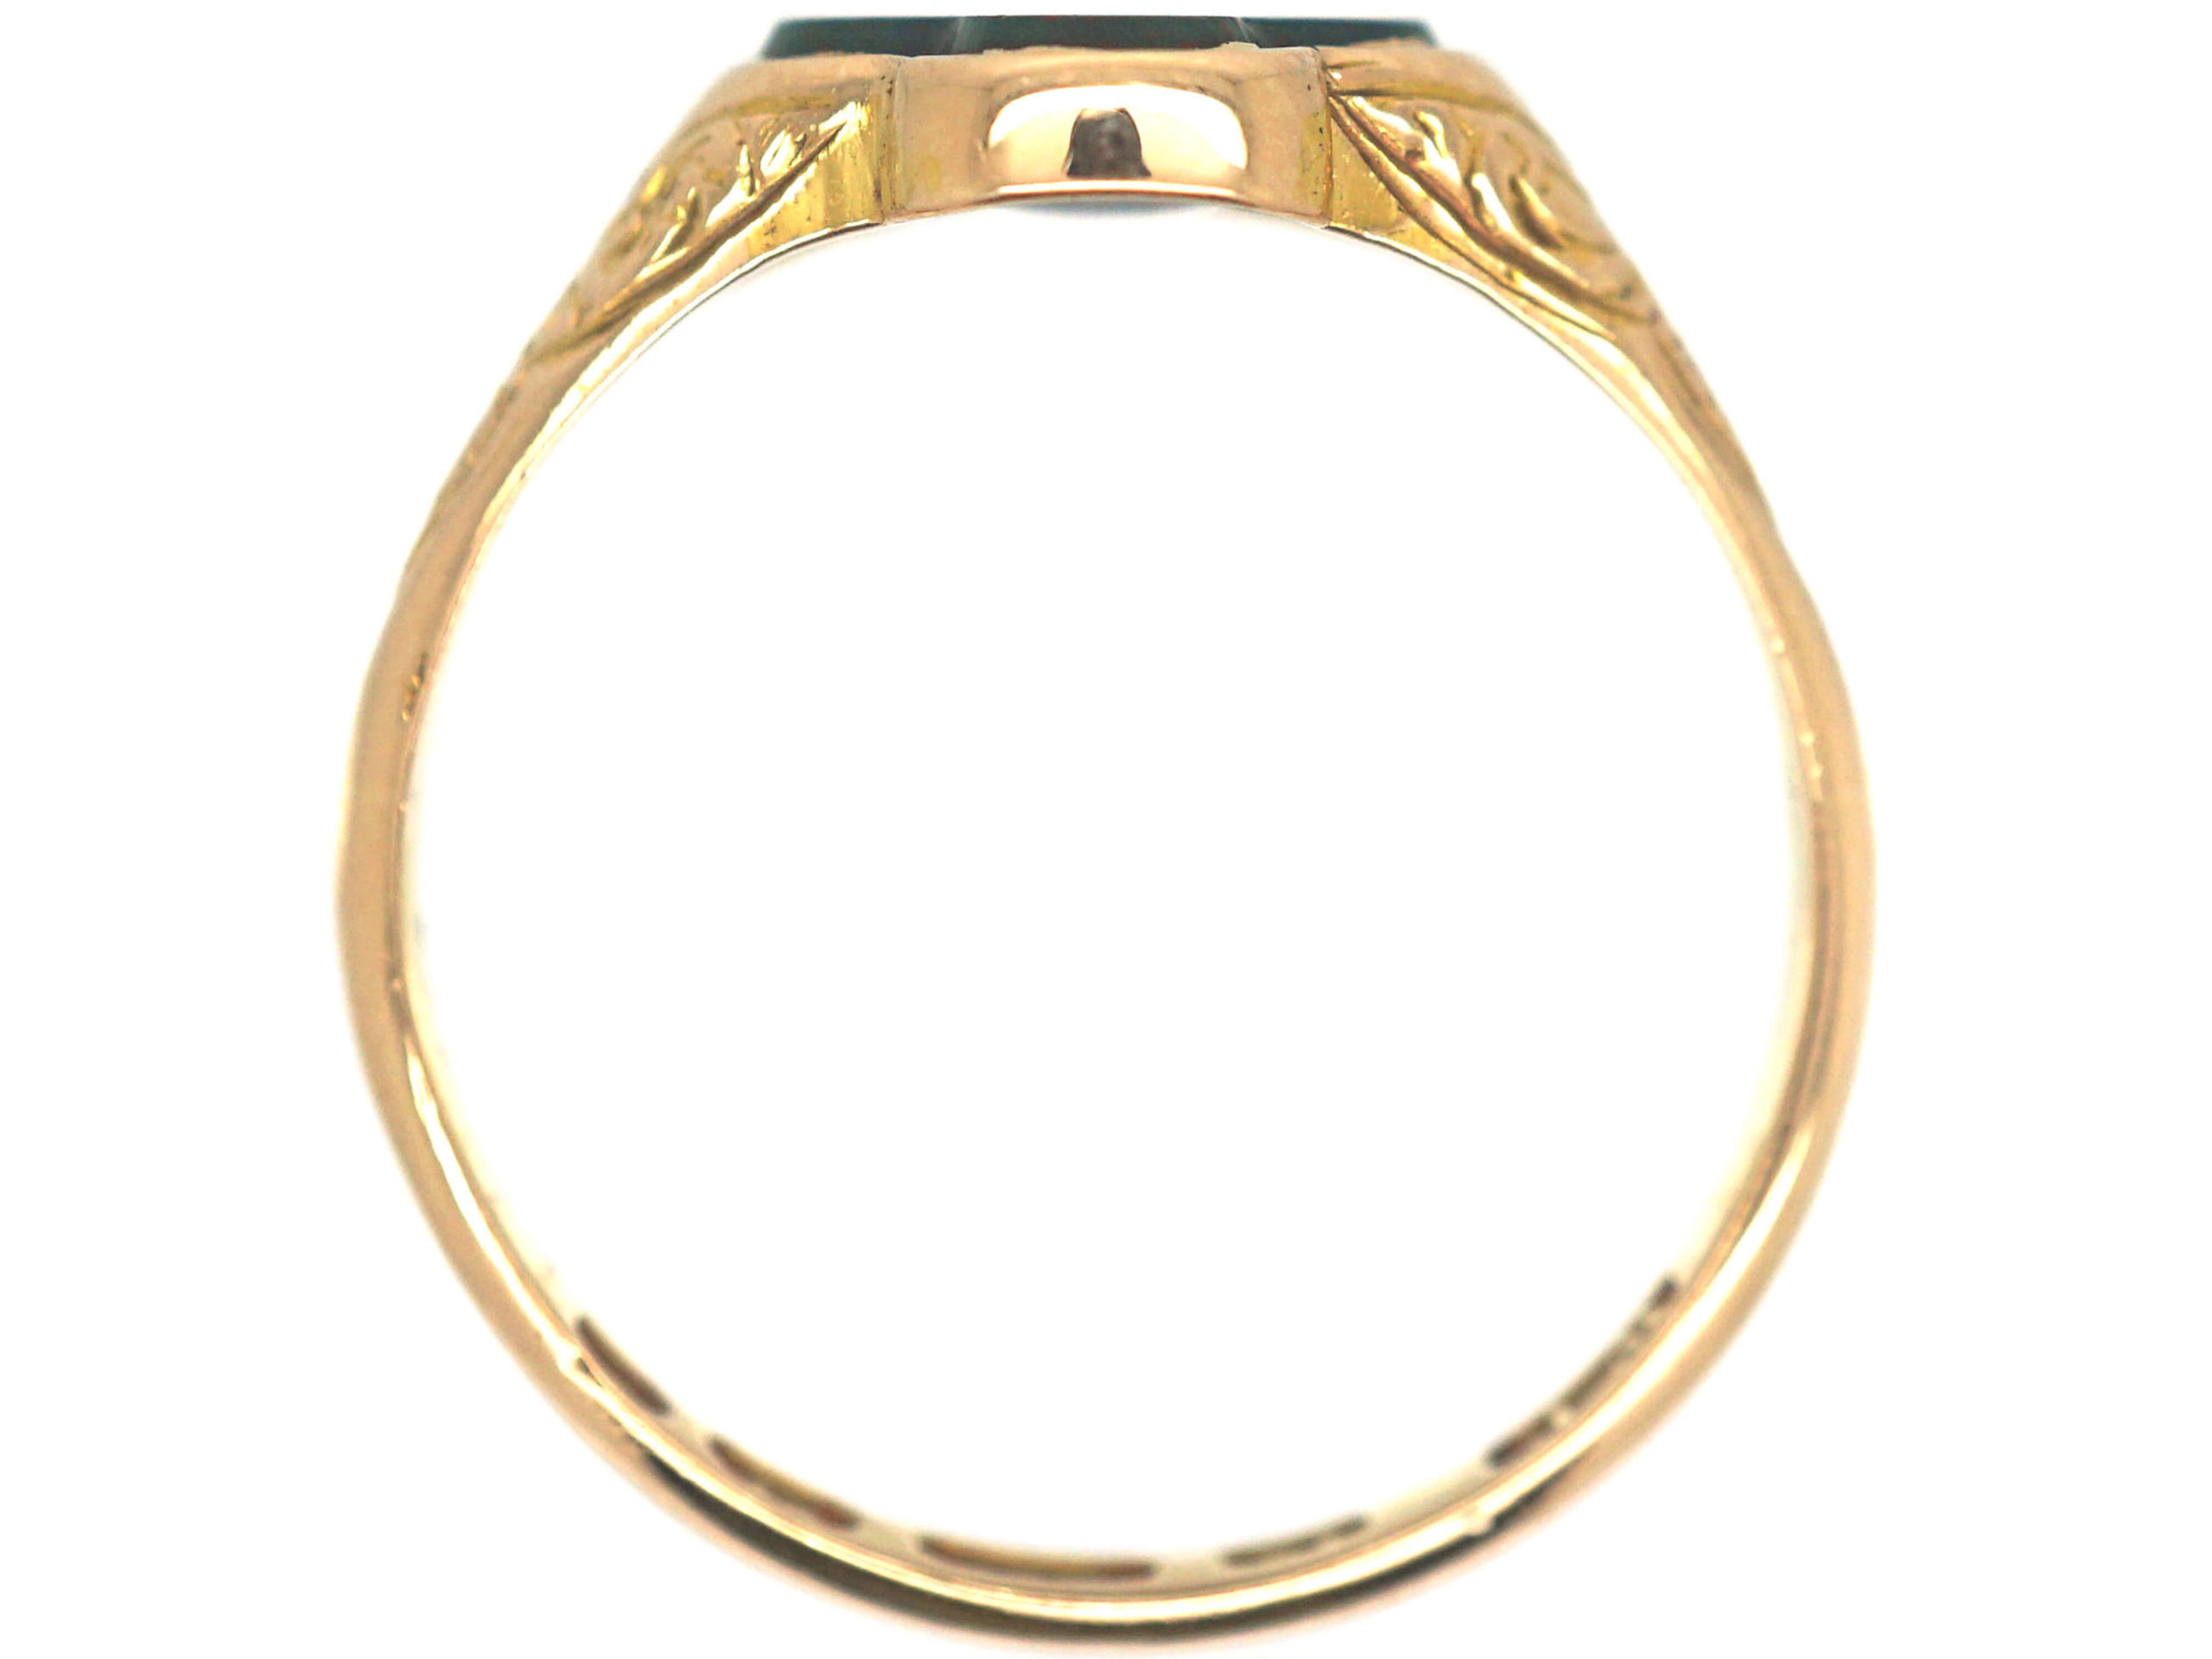 Victorian 15ct Gold & Bloodstone Quatrefoil Ring